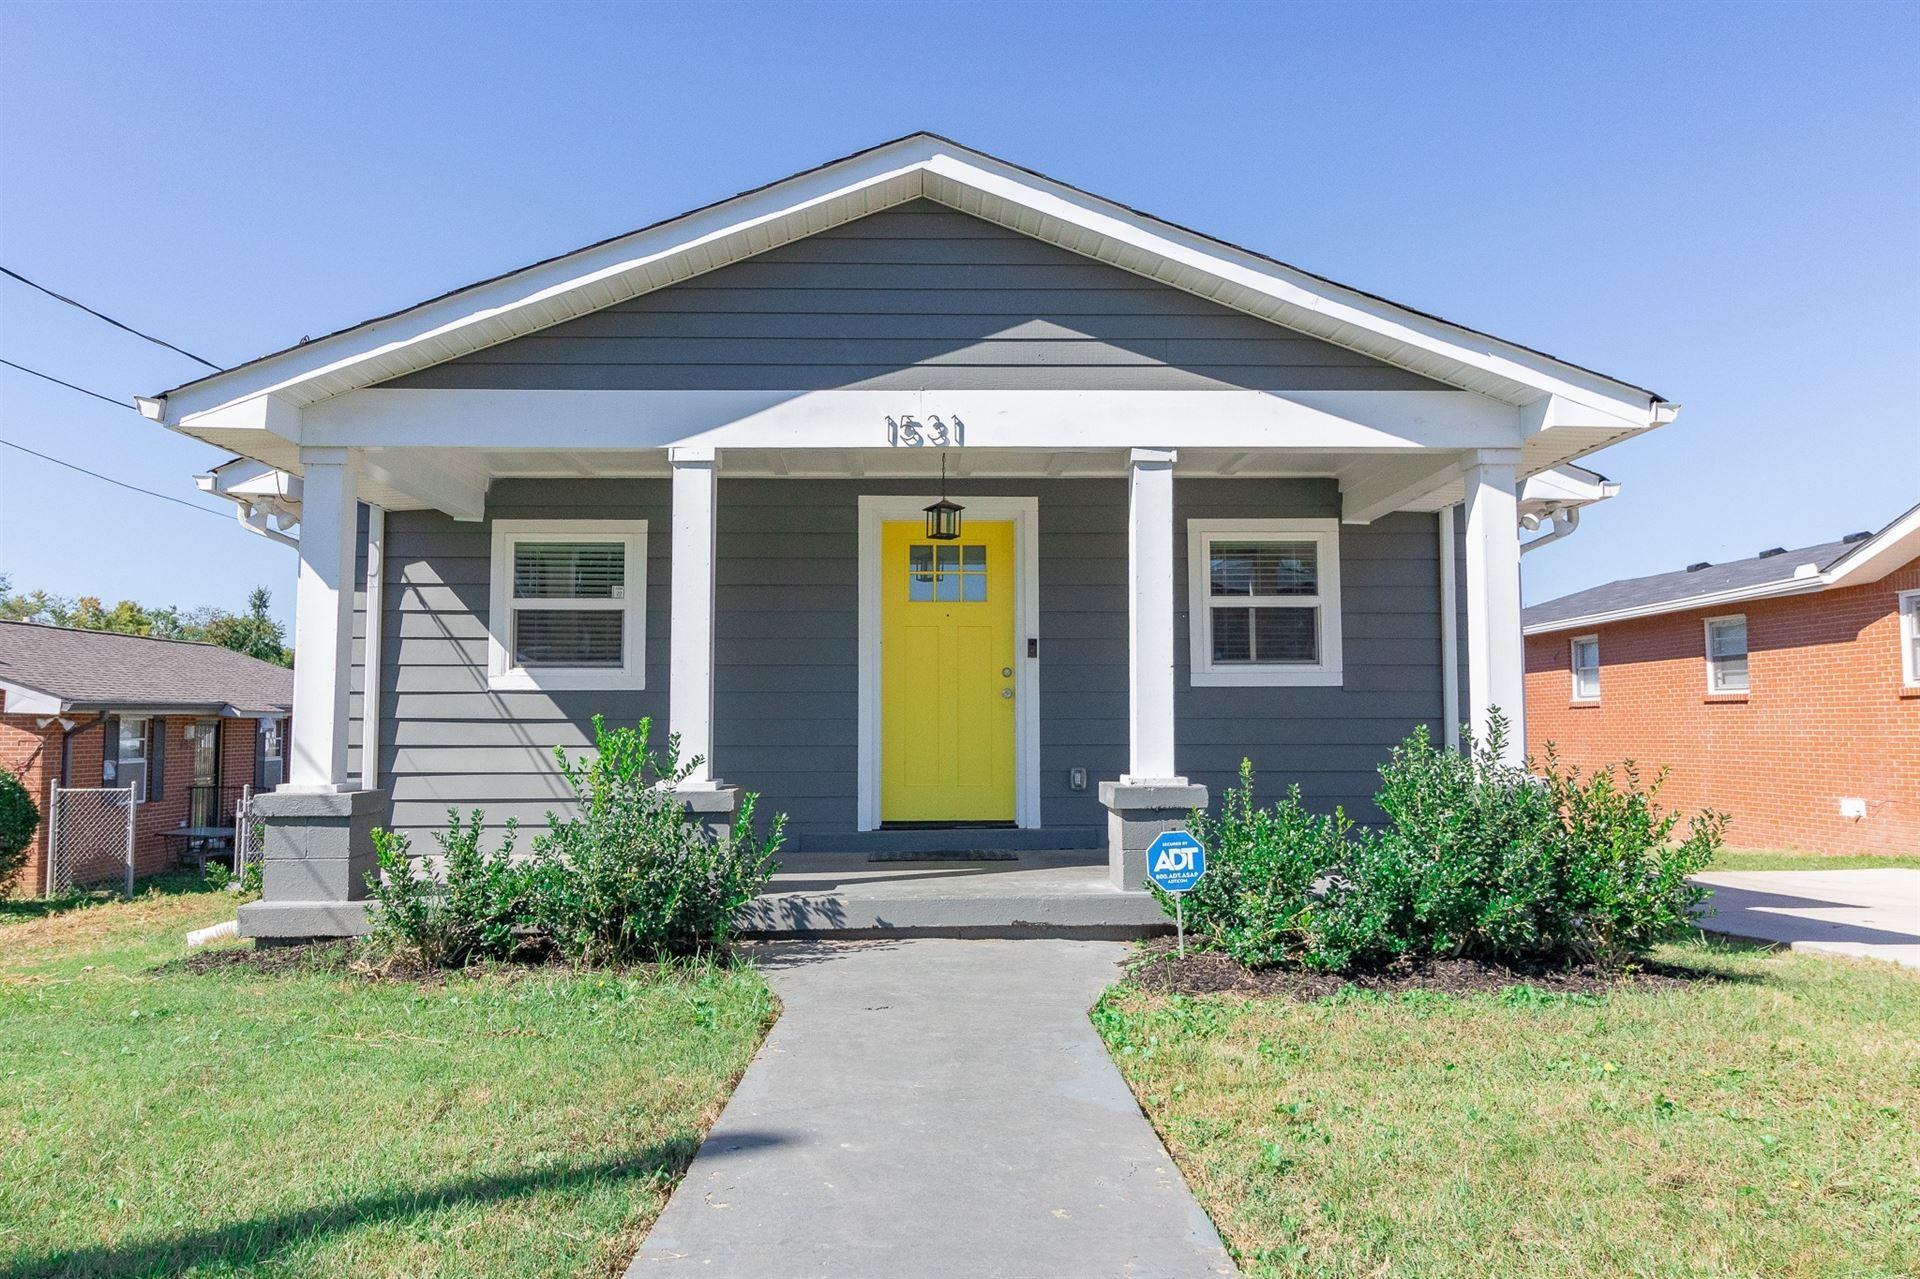 1531 23rd Ave N, Nashville, TN 37208 - MLS#: 2204840